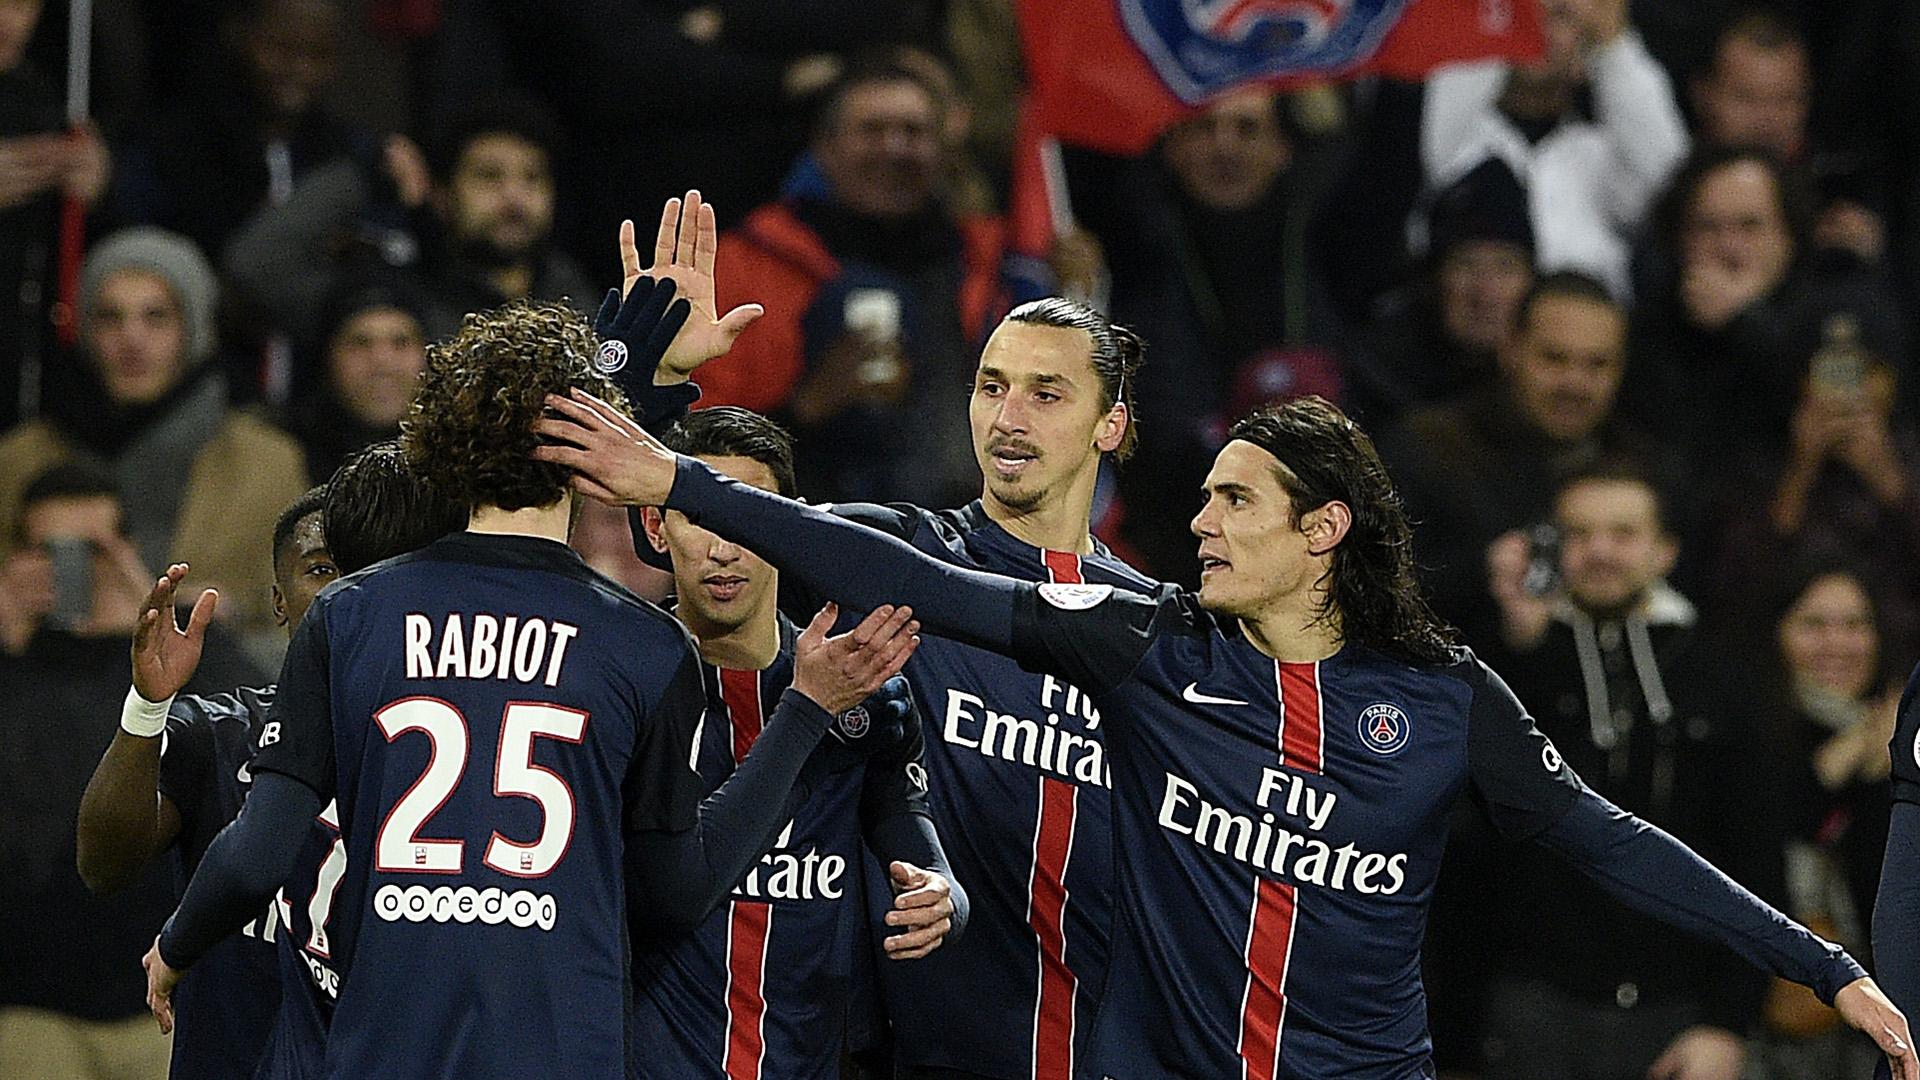 PSG Lyon OL Cavani Ibrahimovic Rabiot Ligue 1 13/12/2015